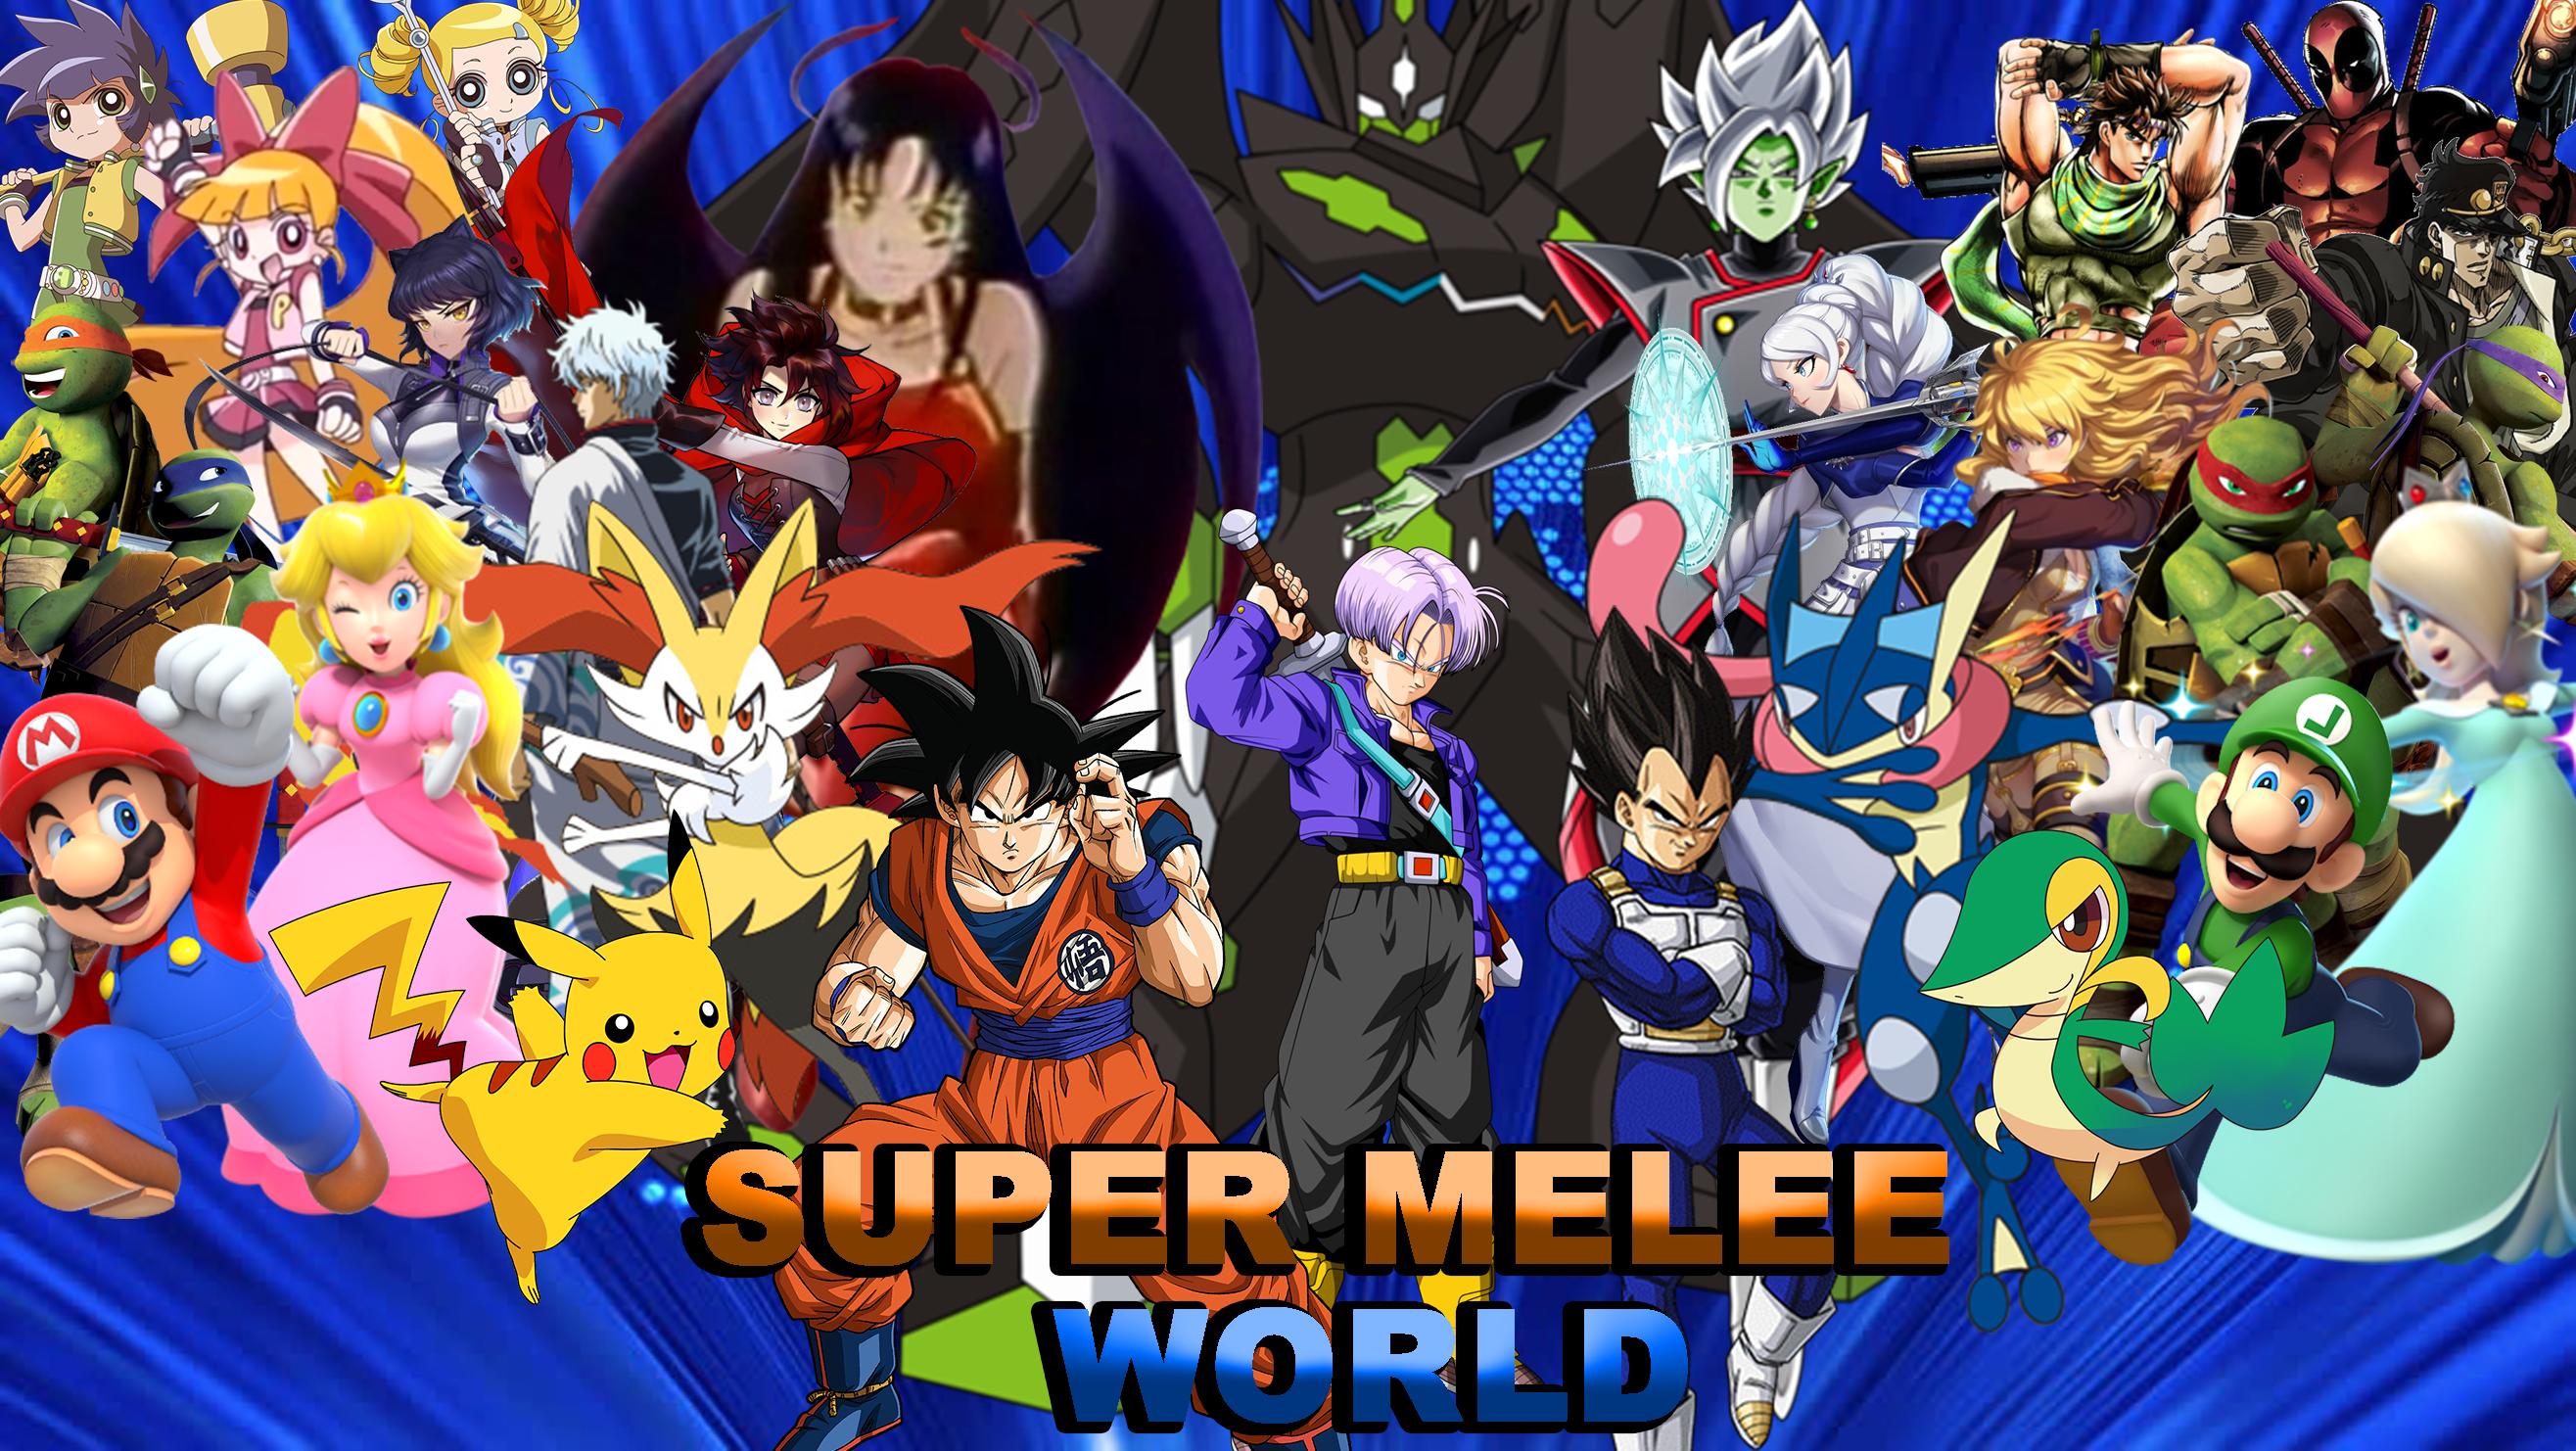 Super Melee World